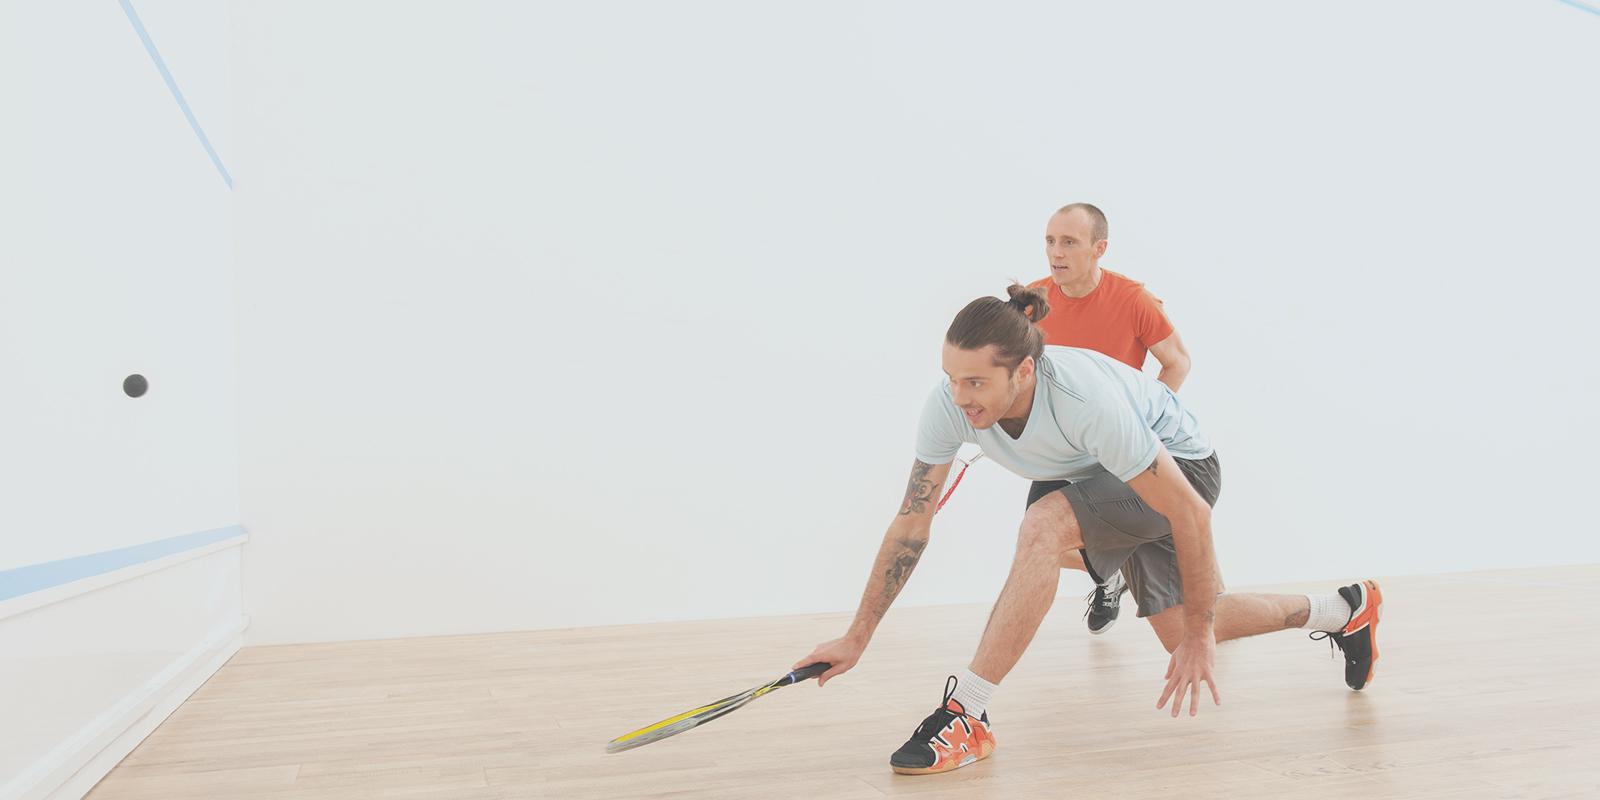 The Squash Club Business Network